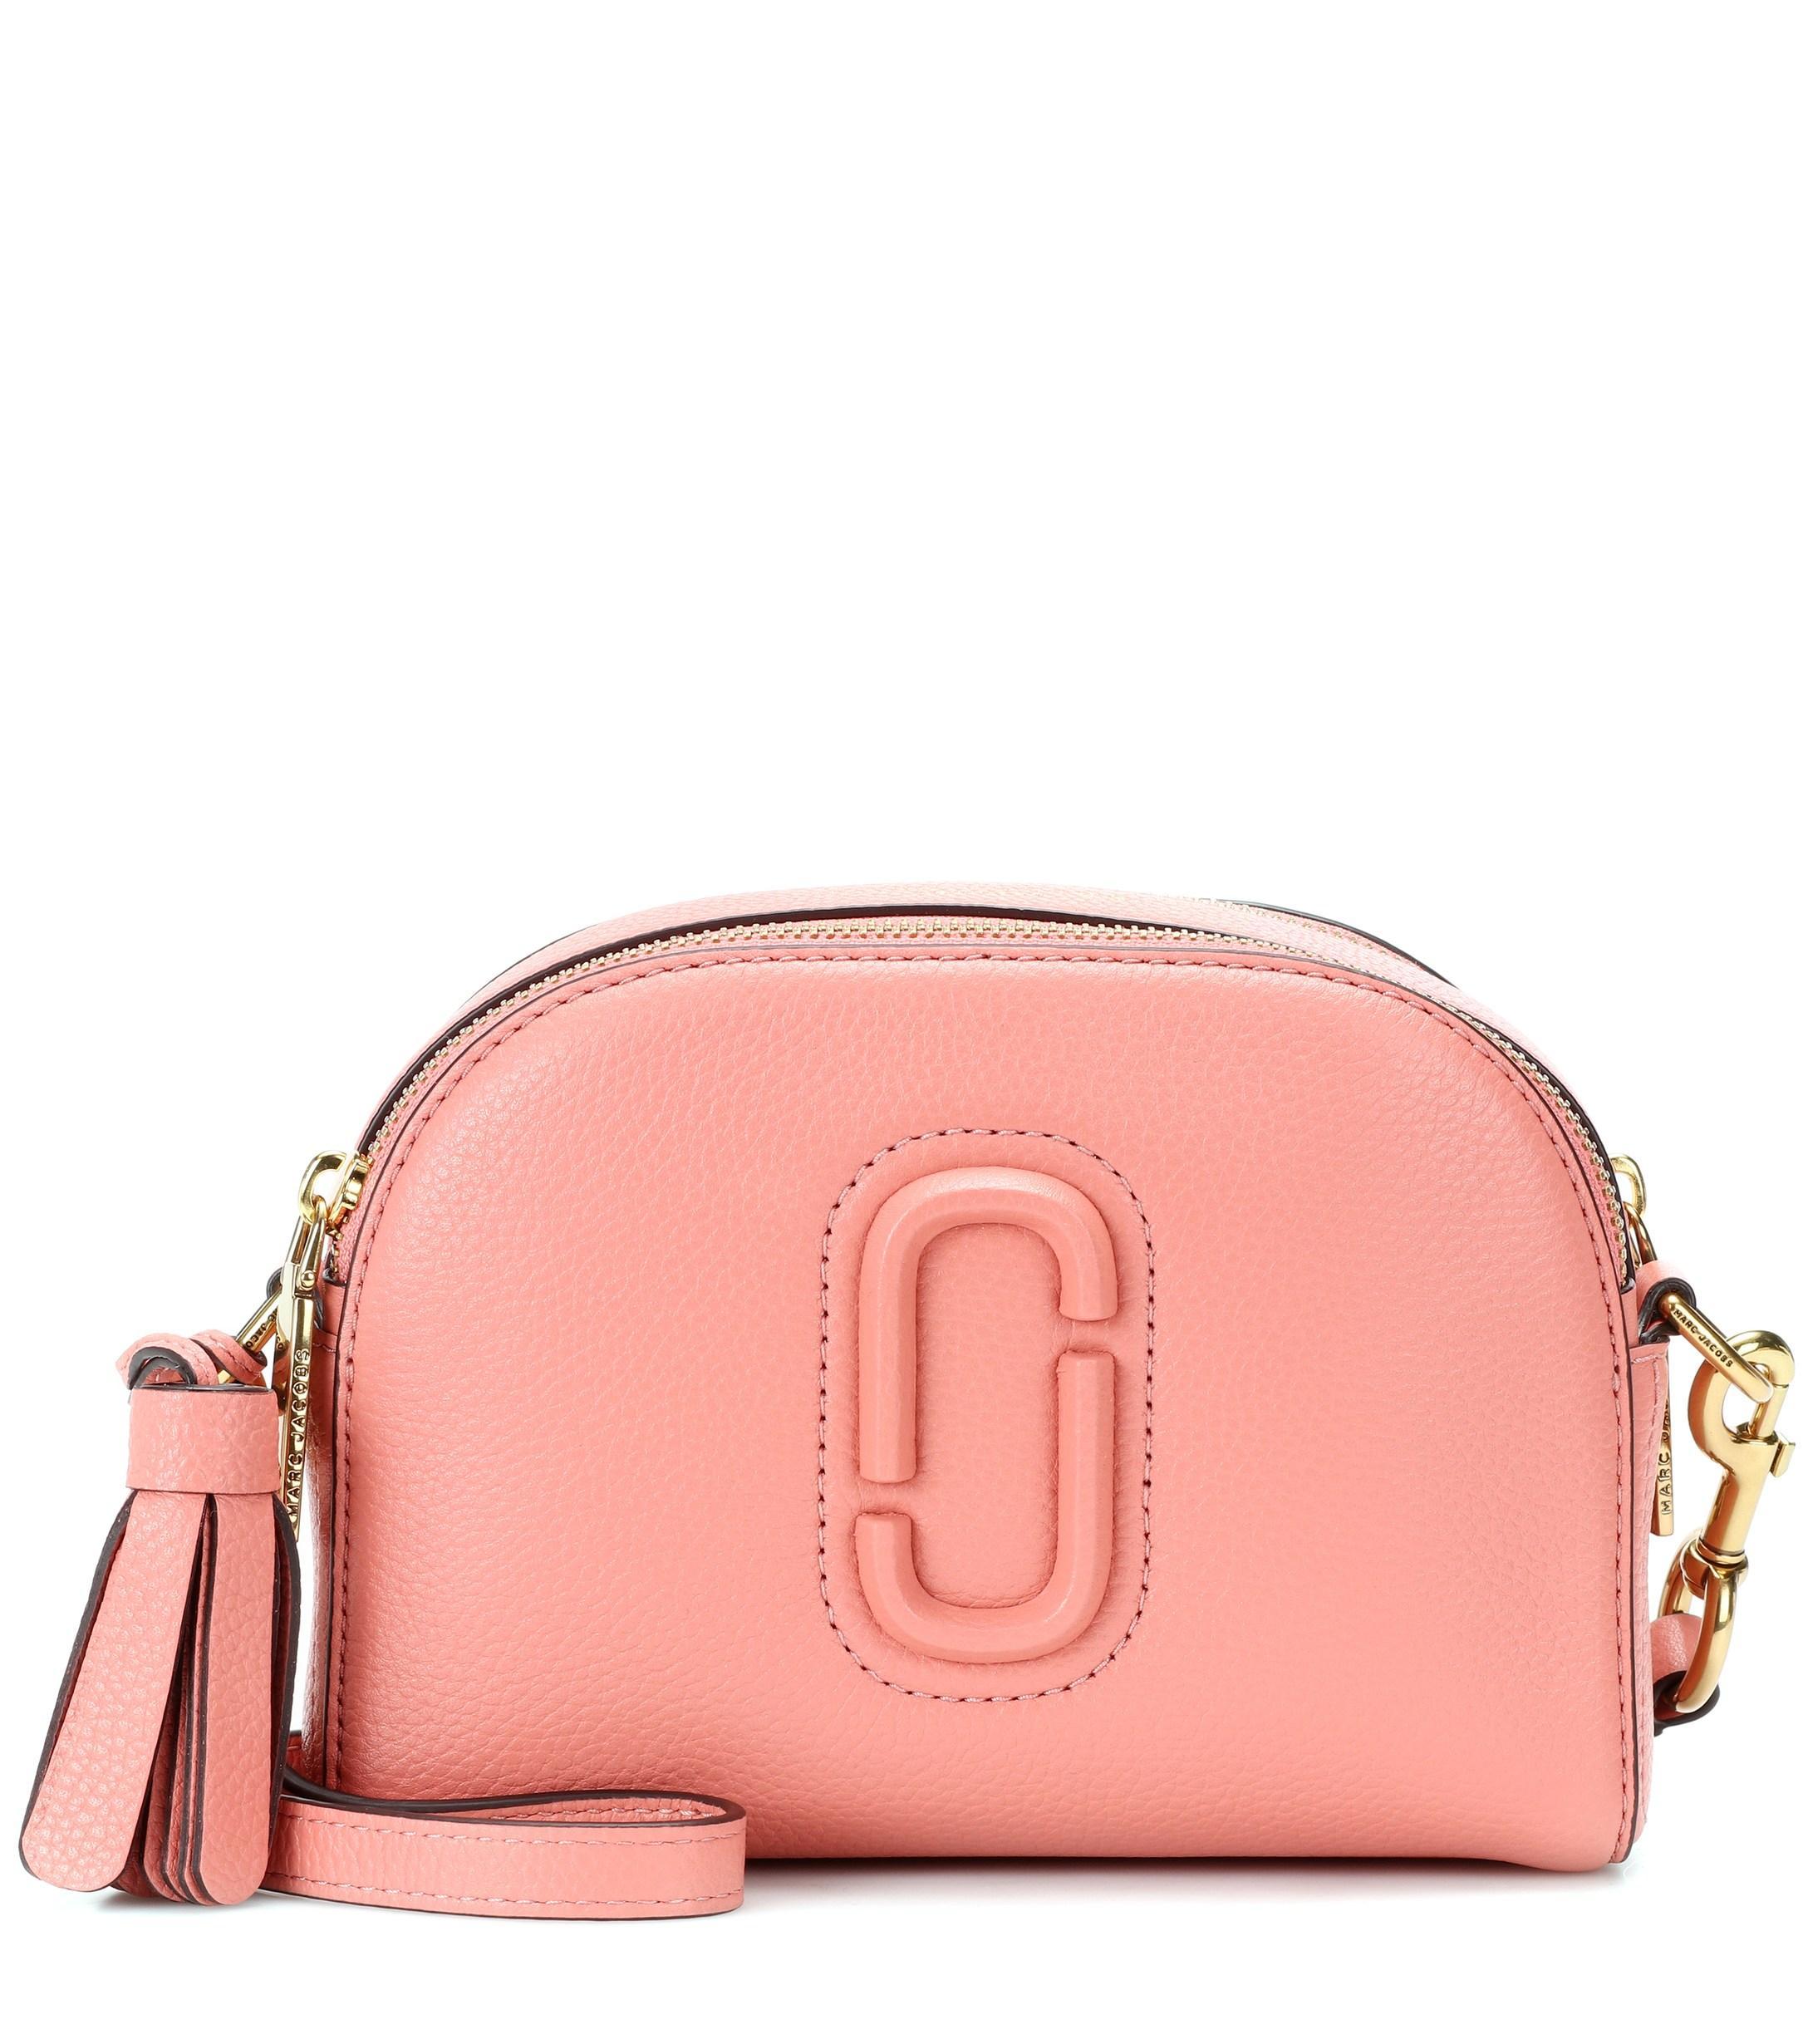 62b3682fc8c8 Marc Jacobs - Pink Shutter Leather Crossbody Bag - Lyst. View fullscreen